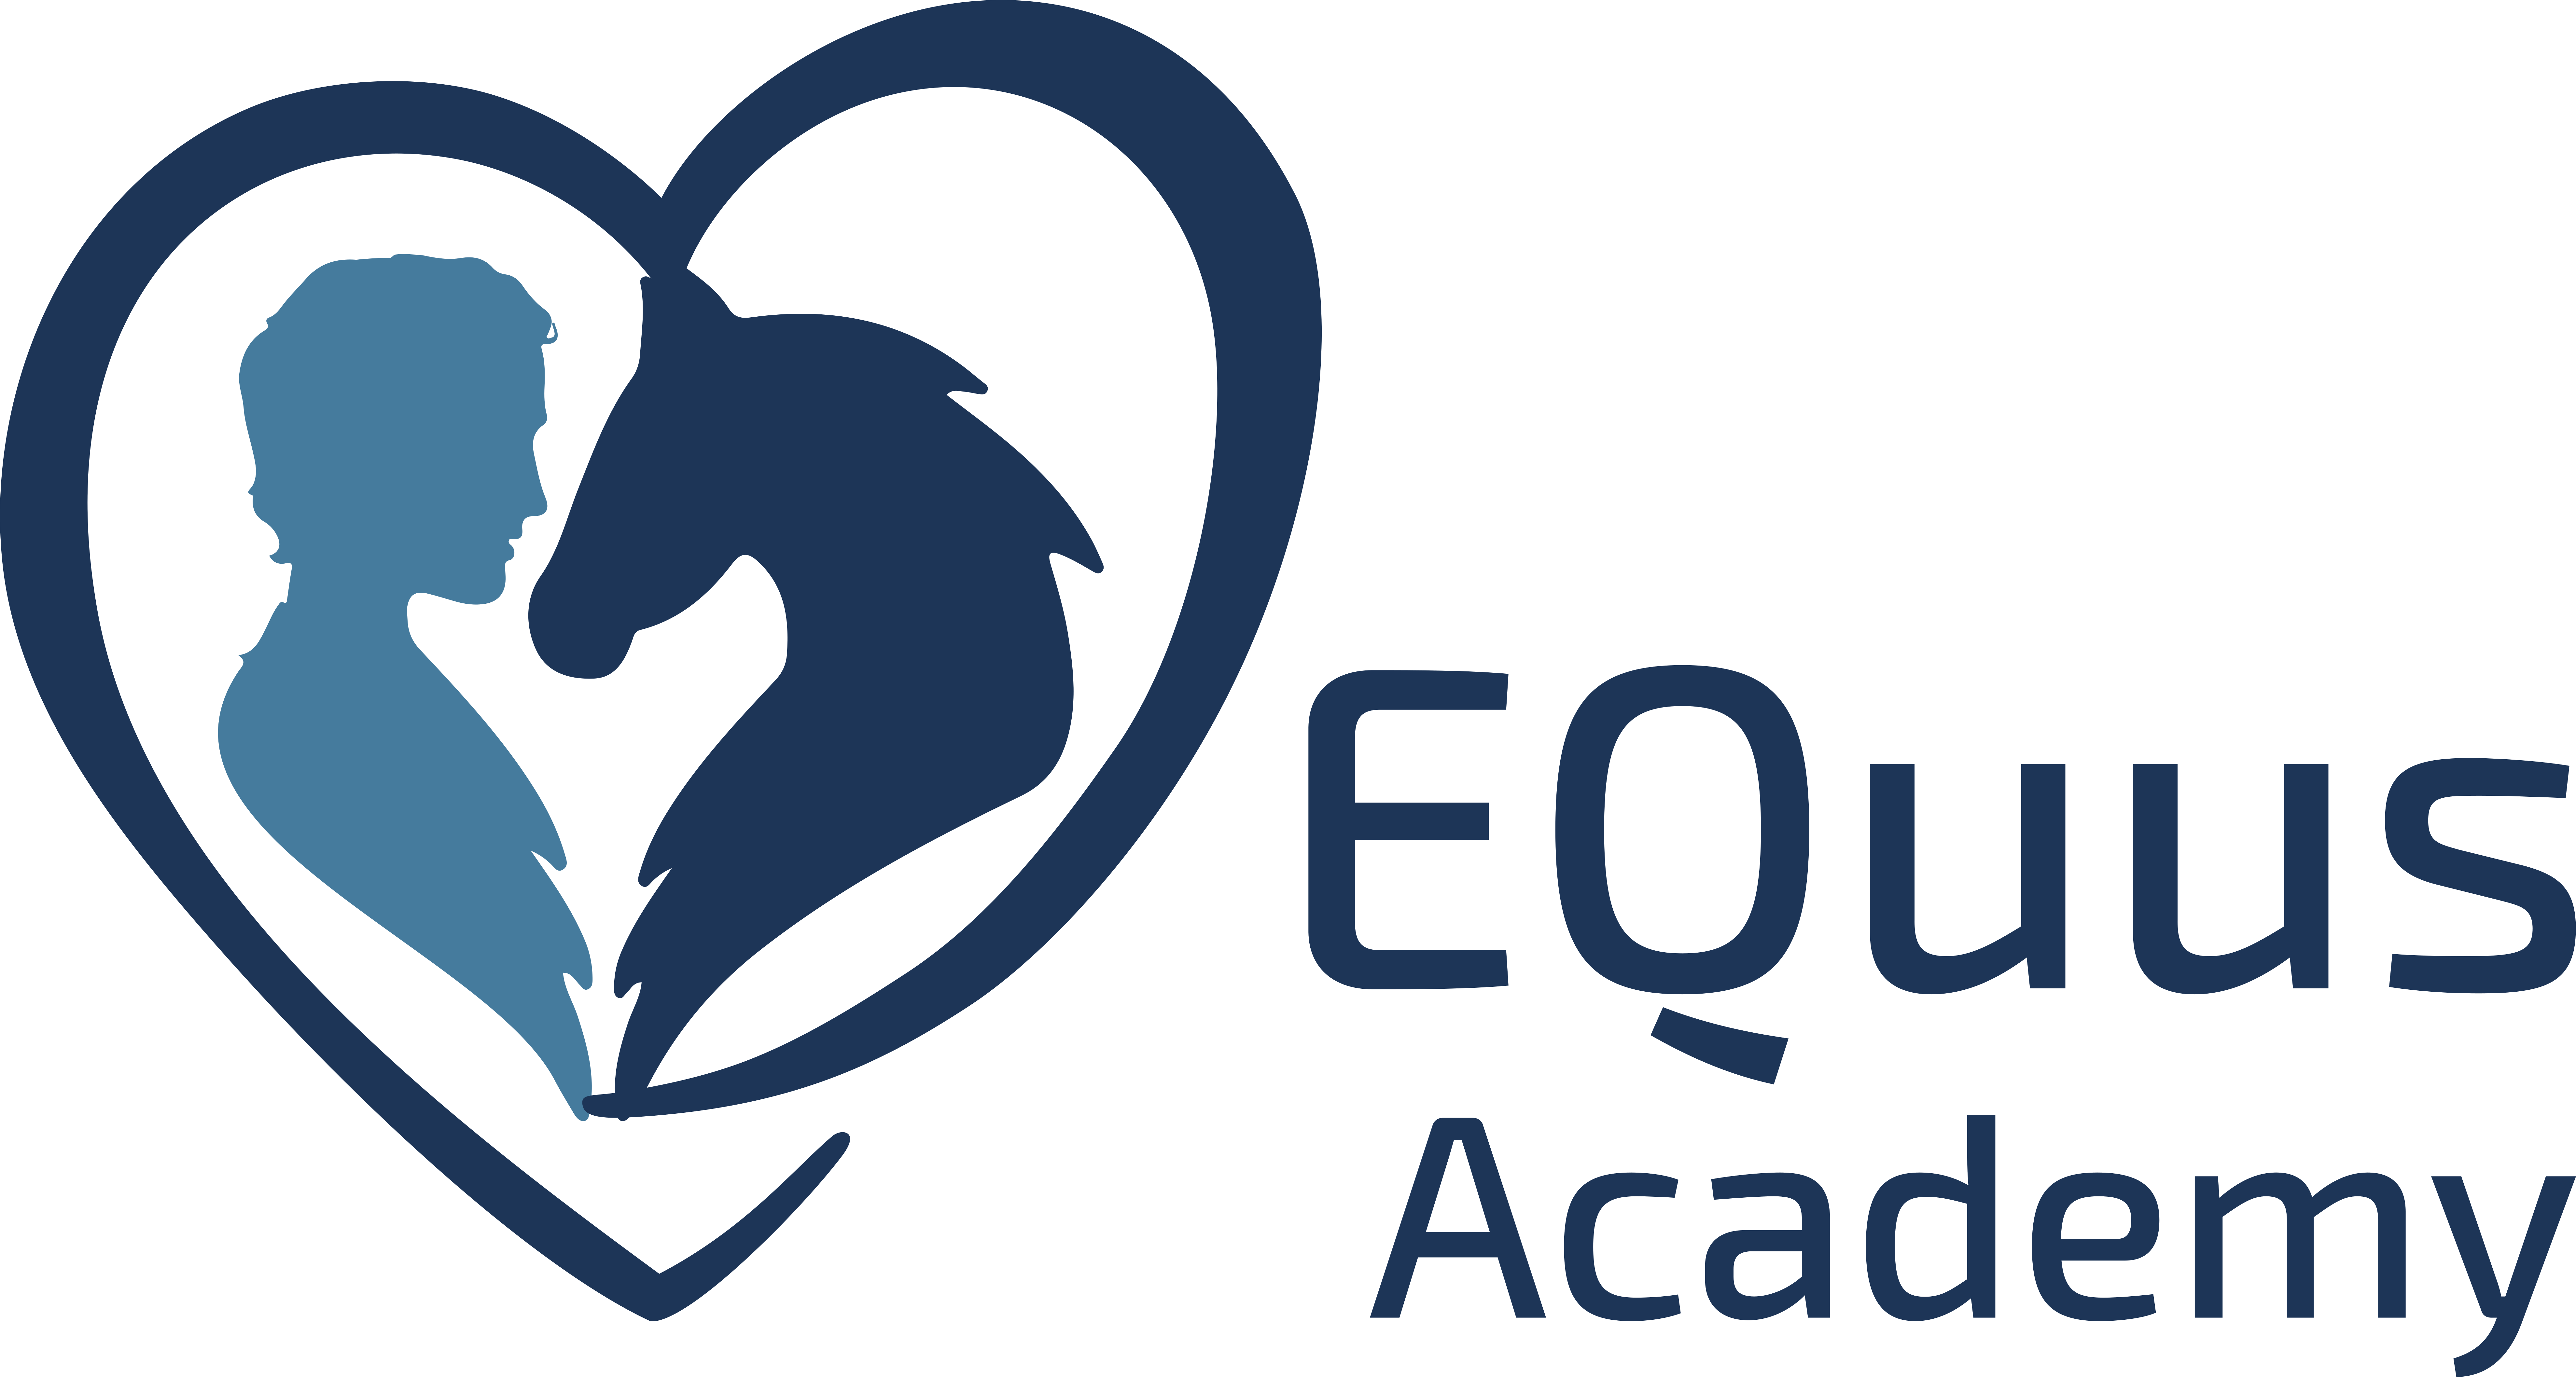 EQuus Academy